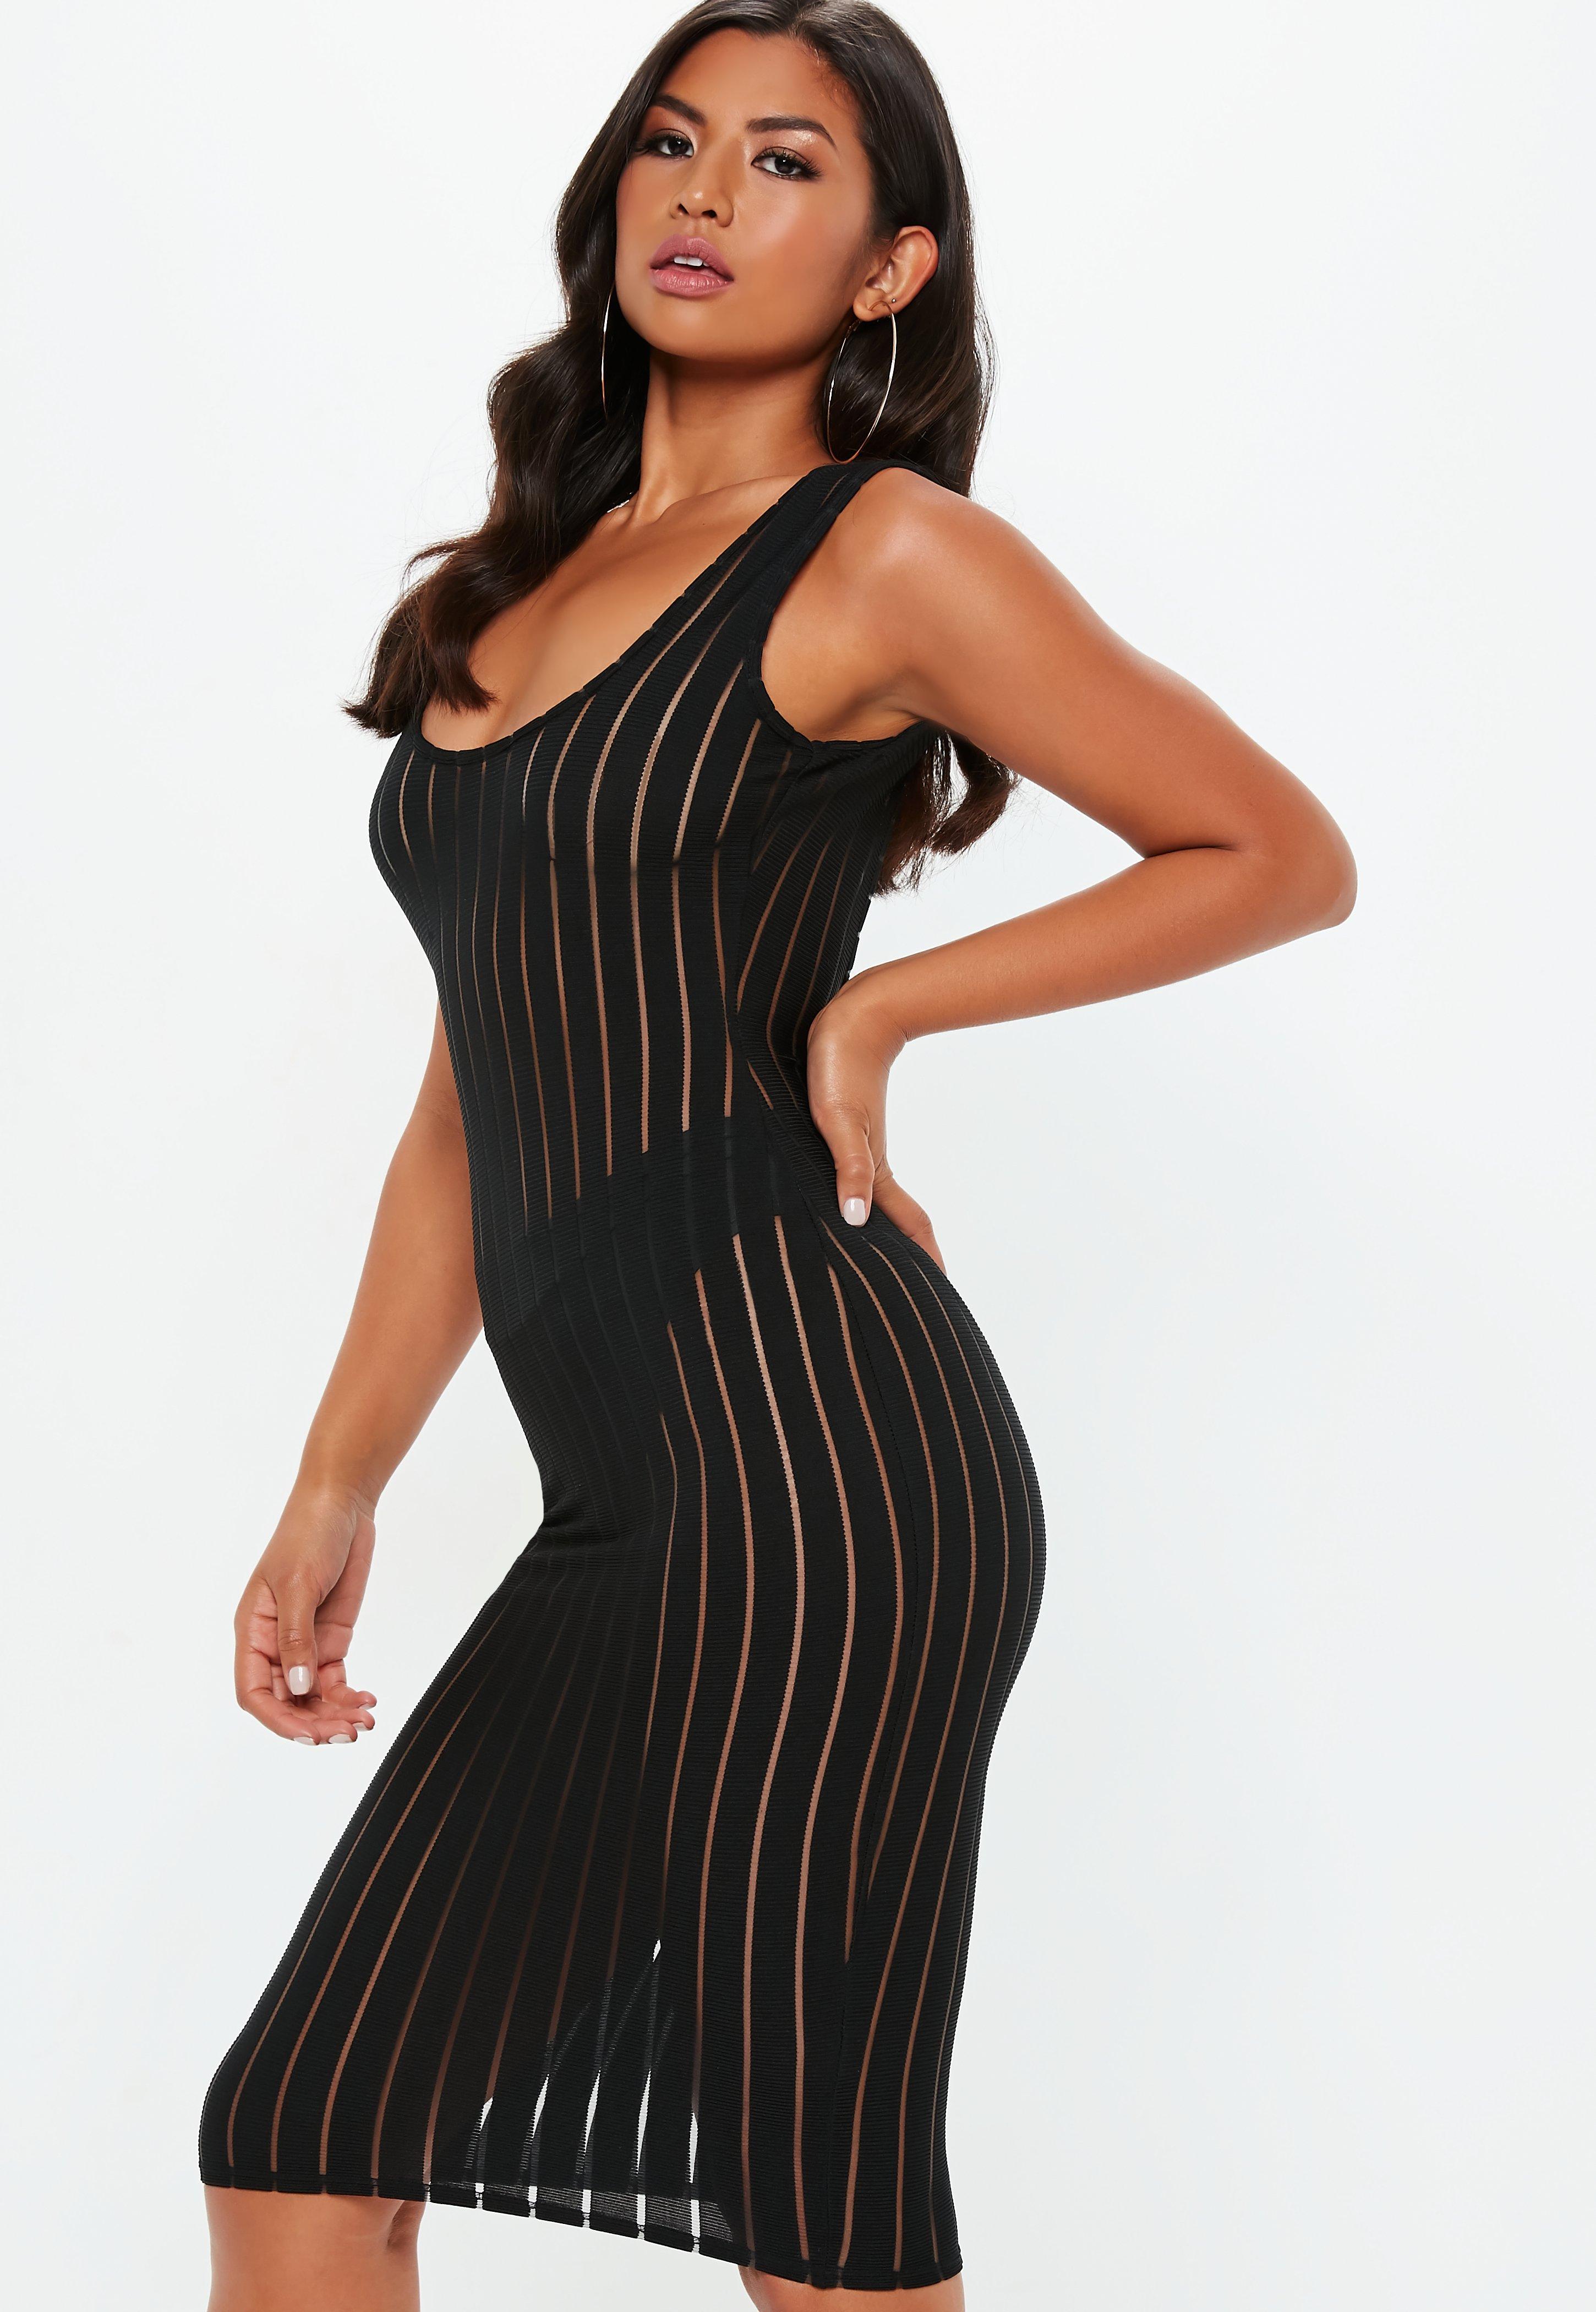 Dating a female banker dress